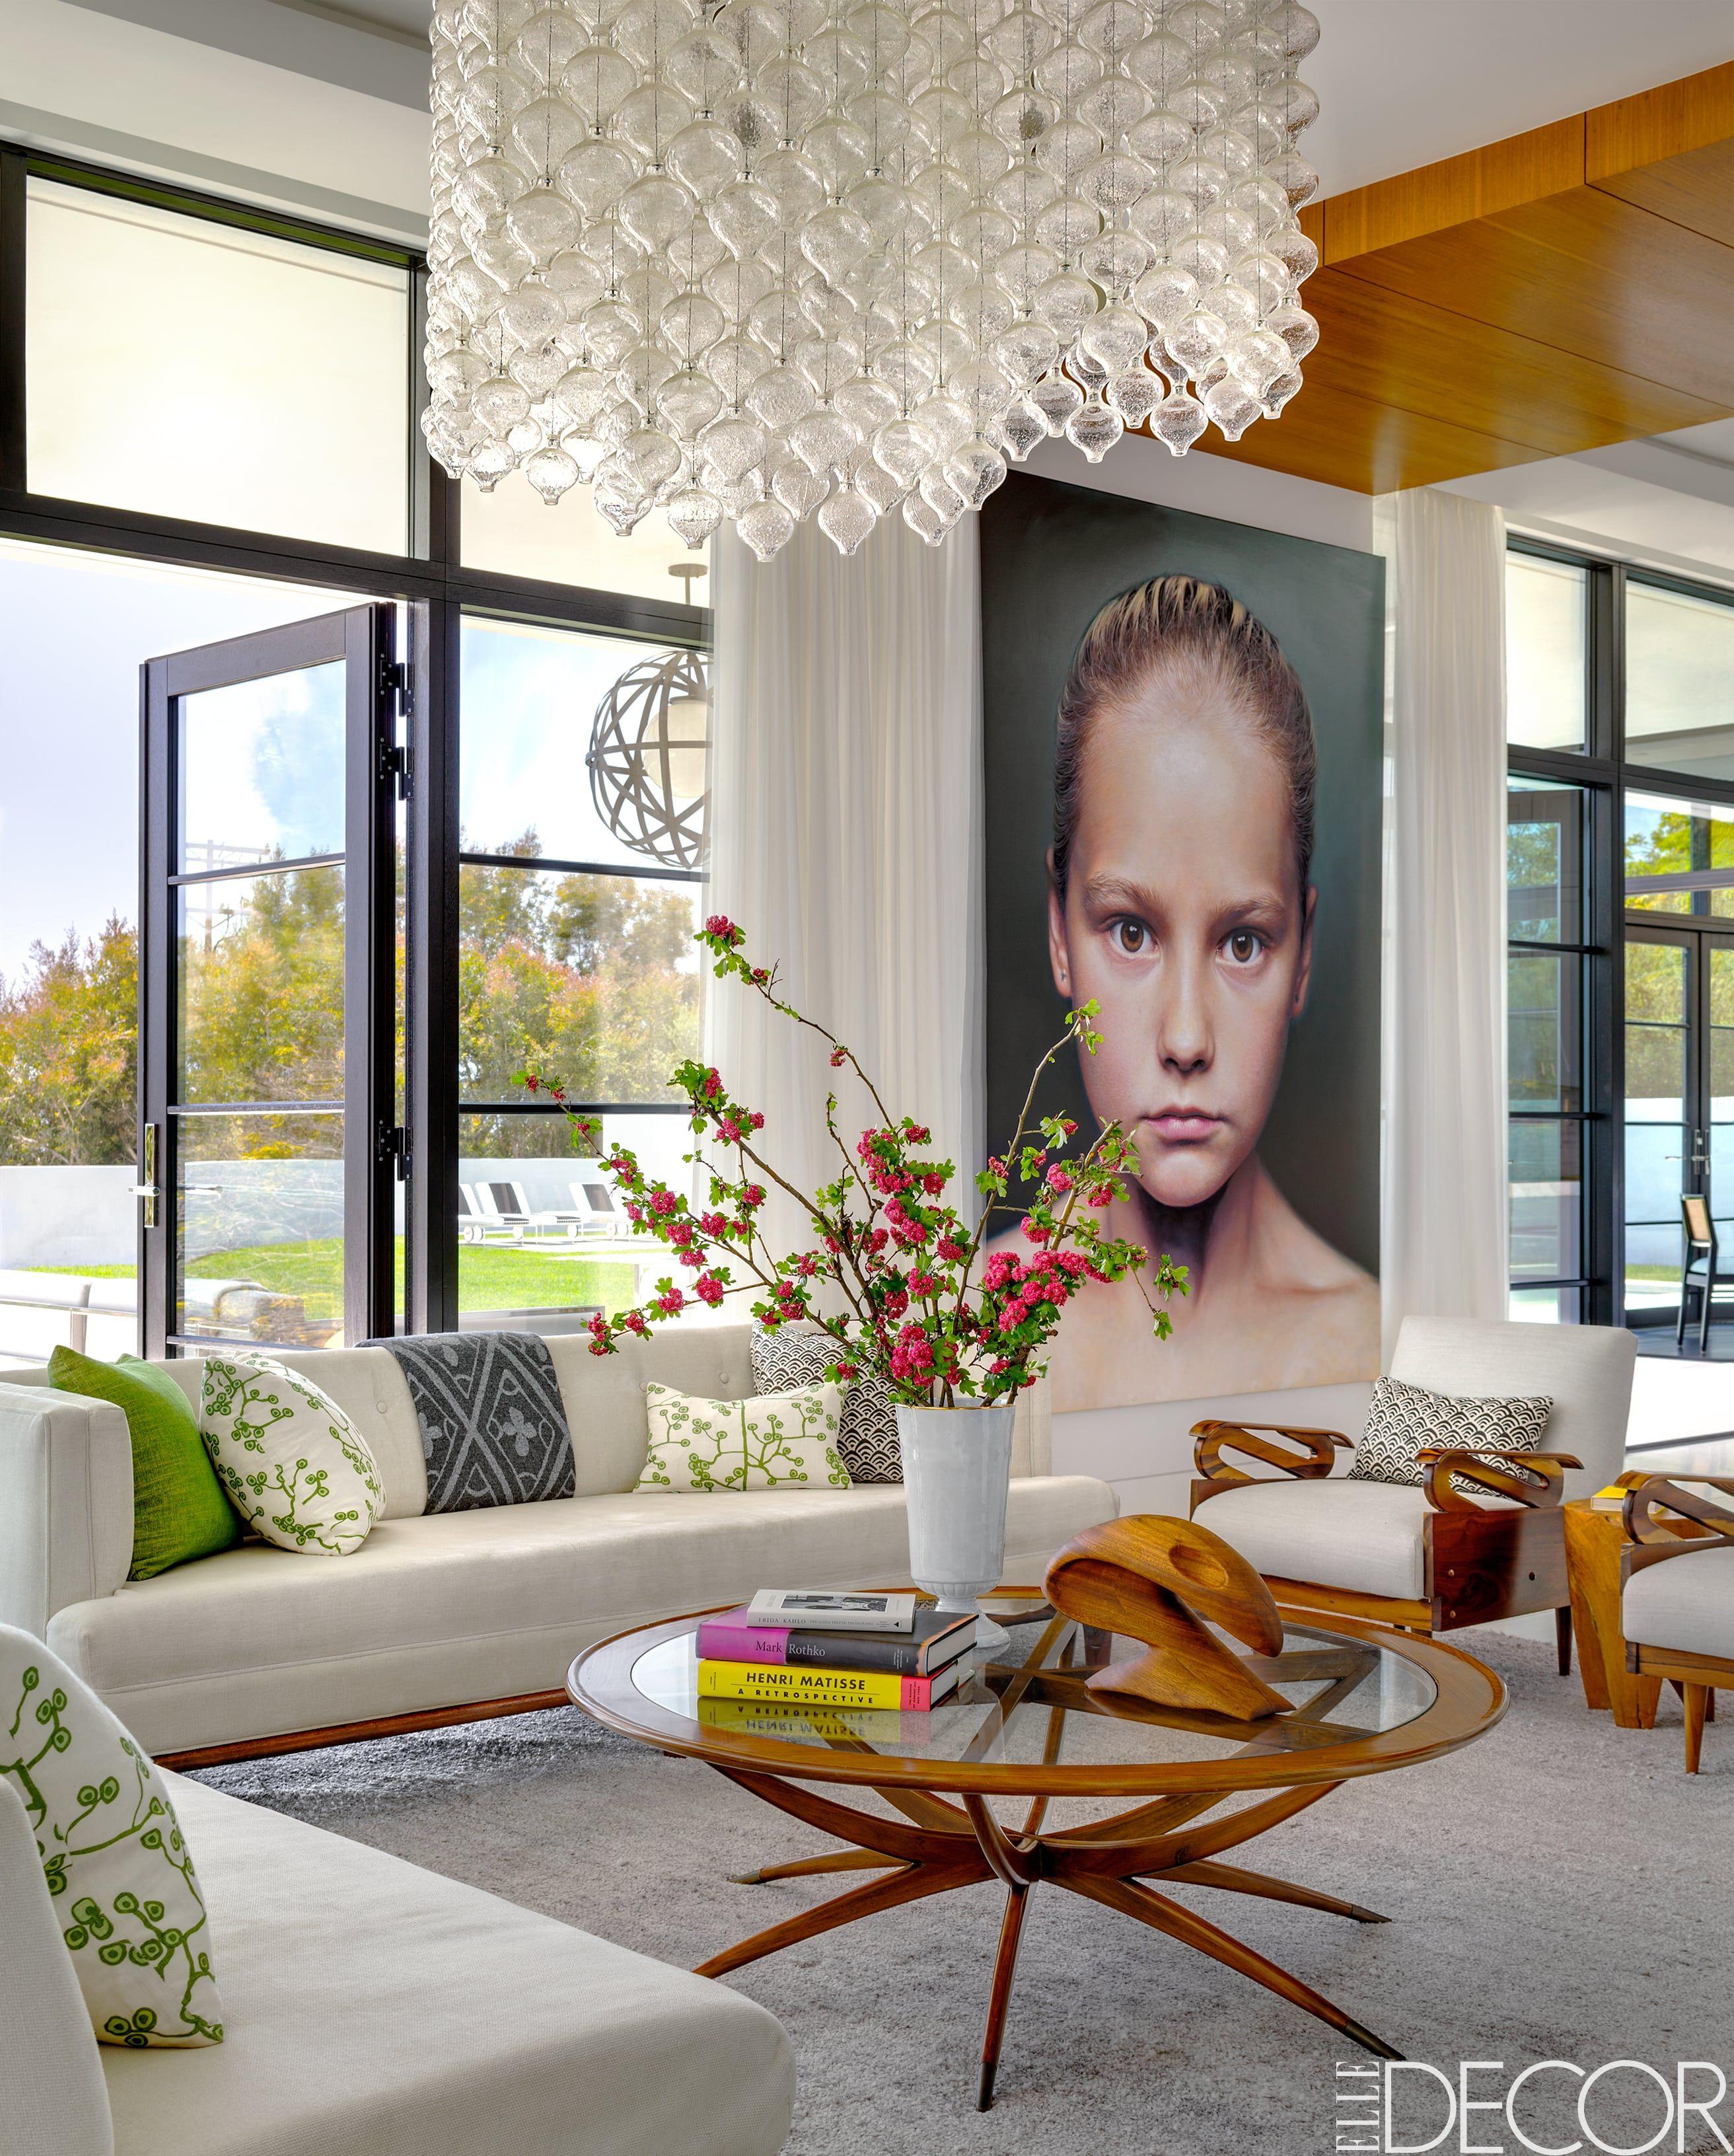 20 Best White Sofa Ideas   Living Room Decorating Ideas For White Sofas